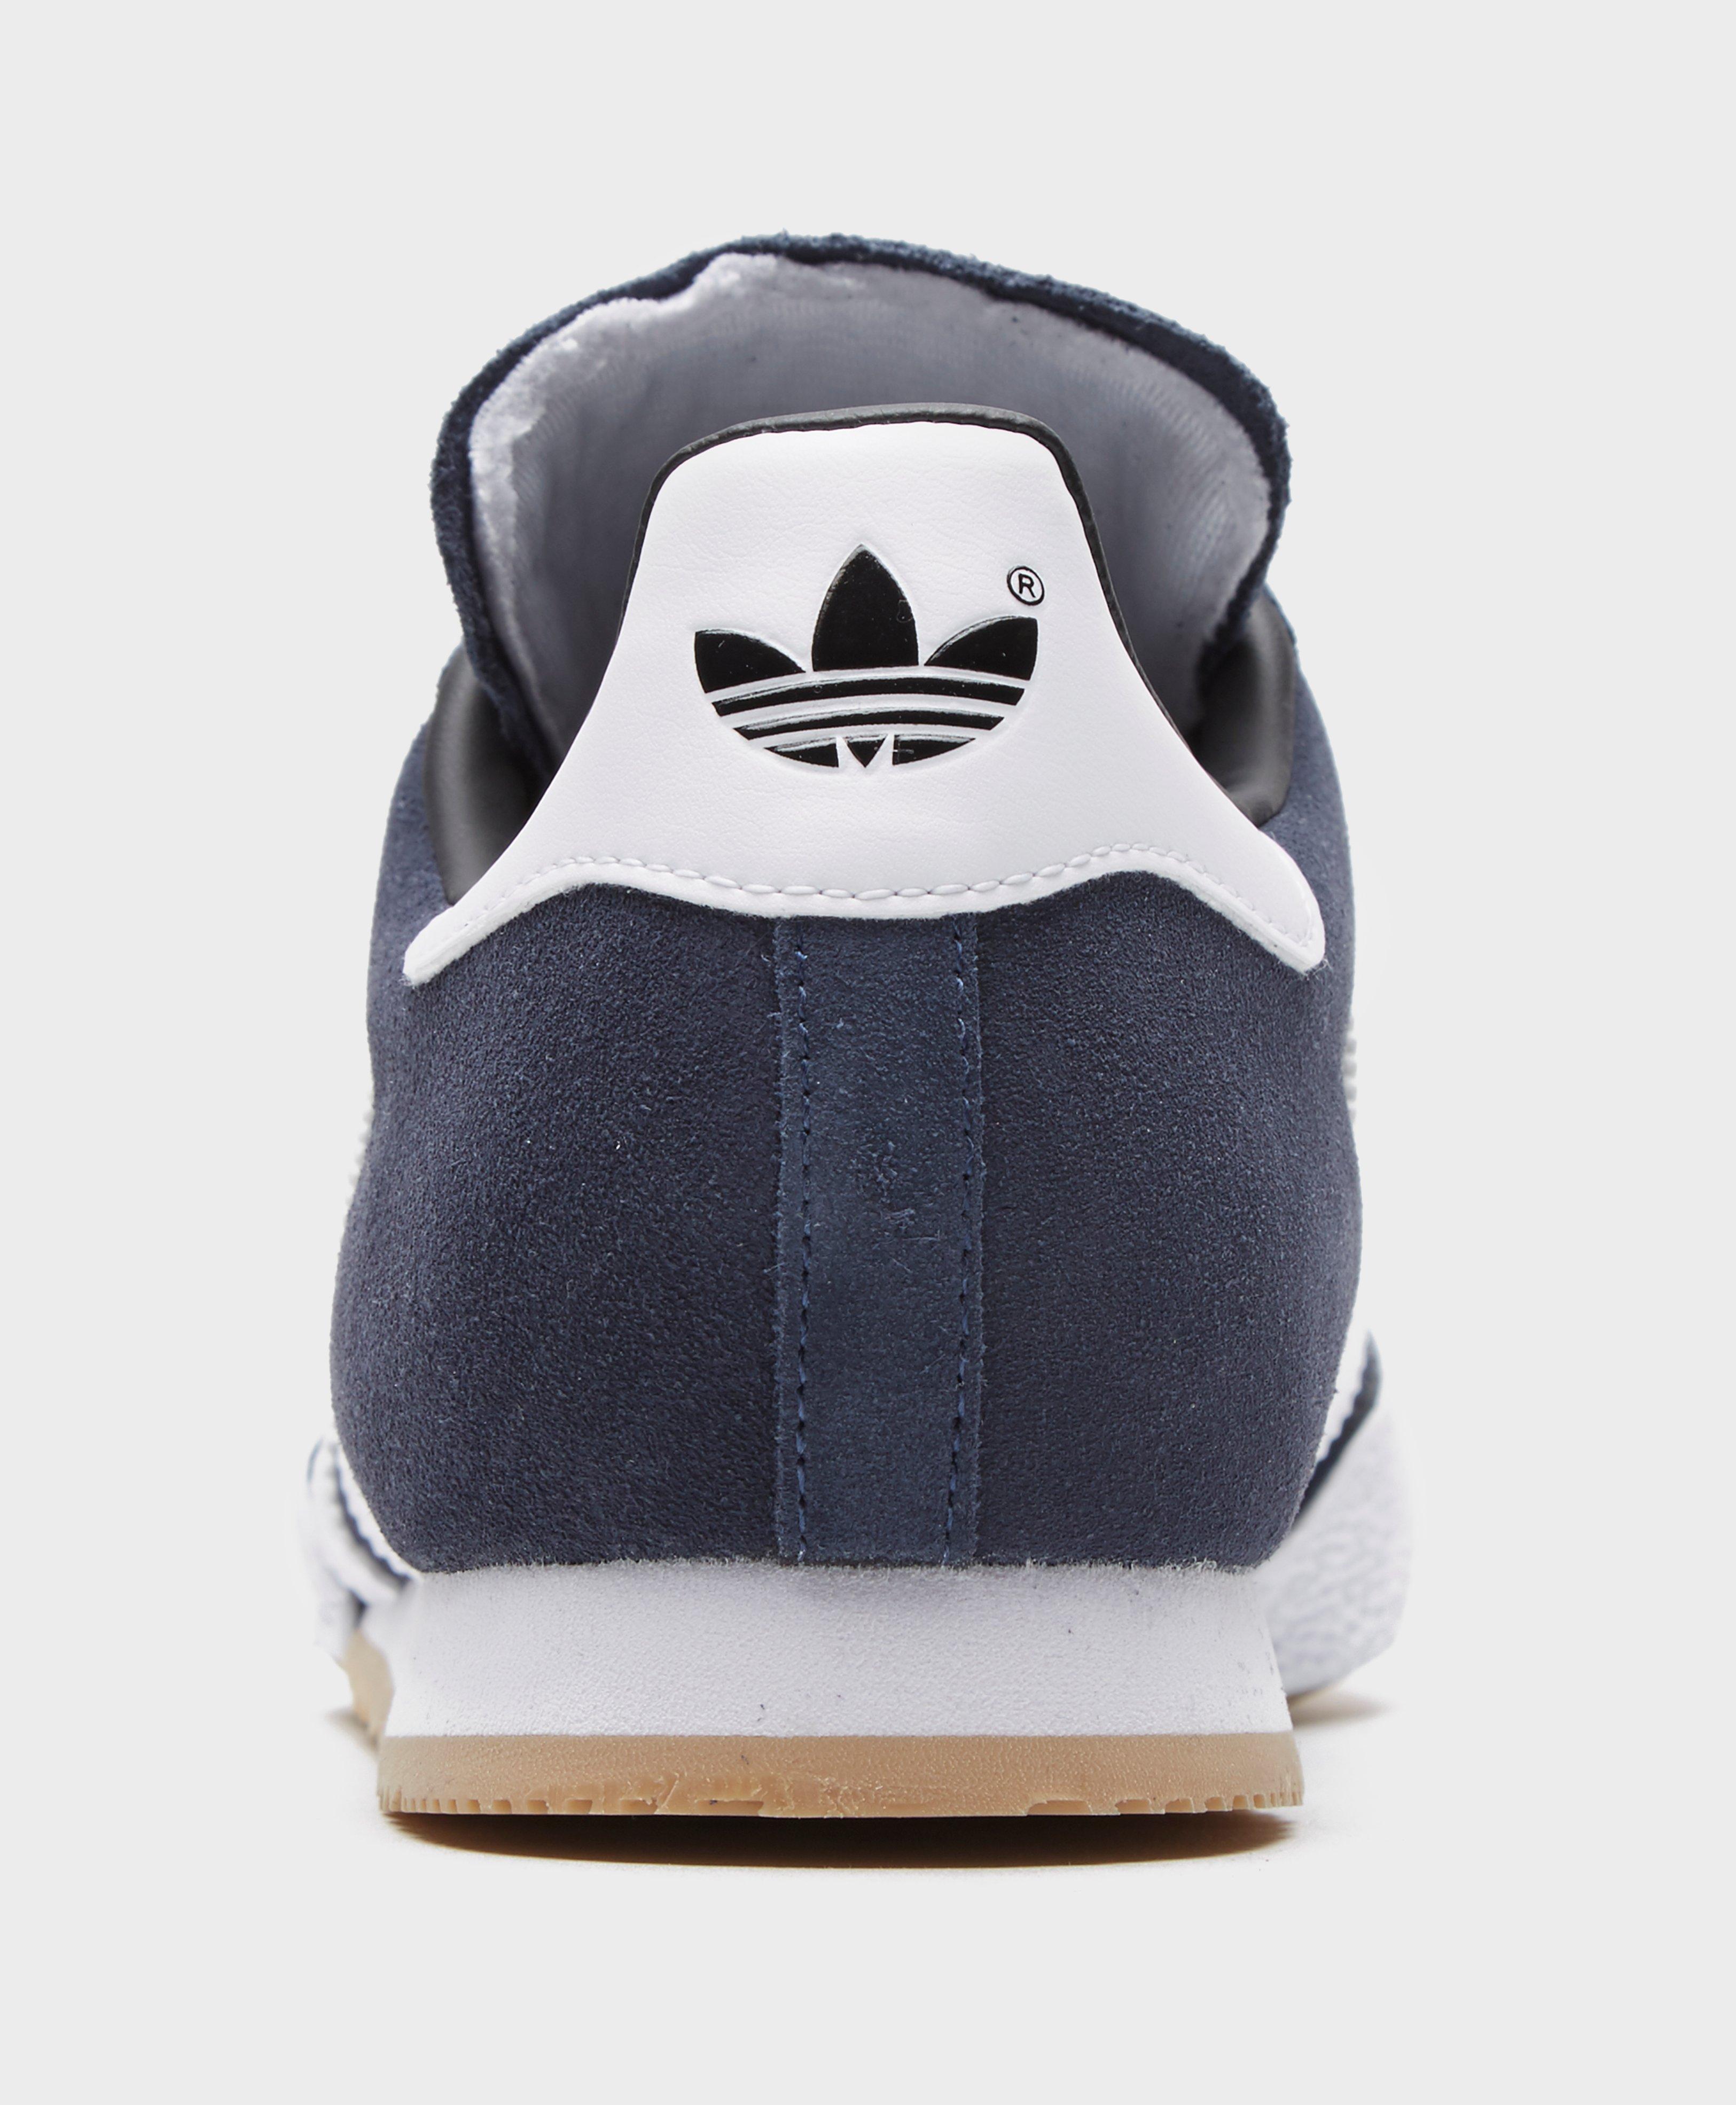 Residuos Quagga natural  adidas Originals Leather Samba Super in Navy Blue (Blue) for Men - Save 51%  - Lyst